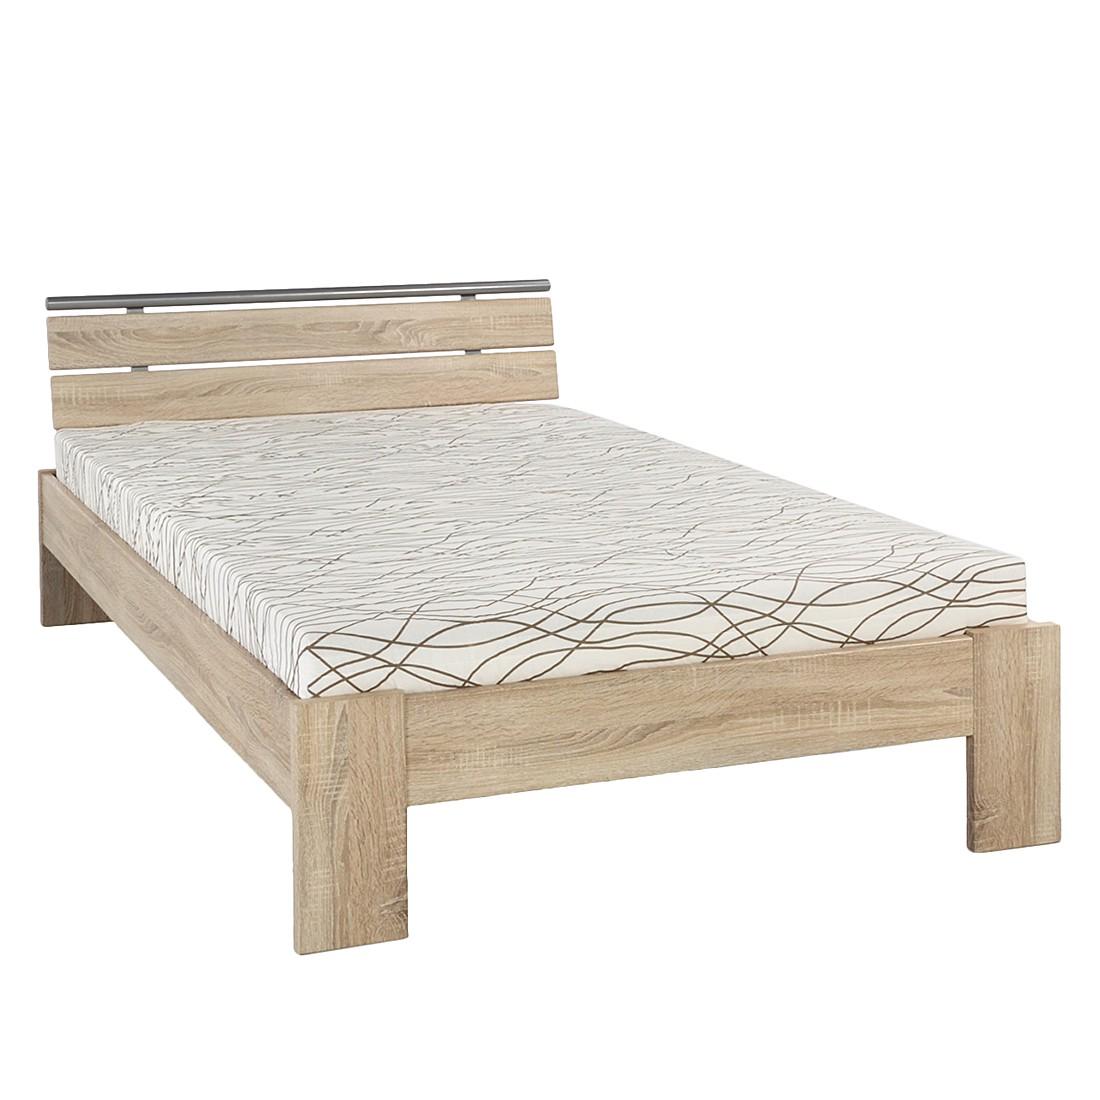 bett online simple paletten bett online kaufen genial bett kaufen ikea with bett online with. Black Bedroom Furniture Sets. Home Design Ideas